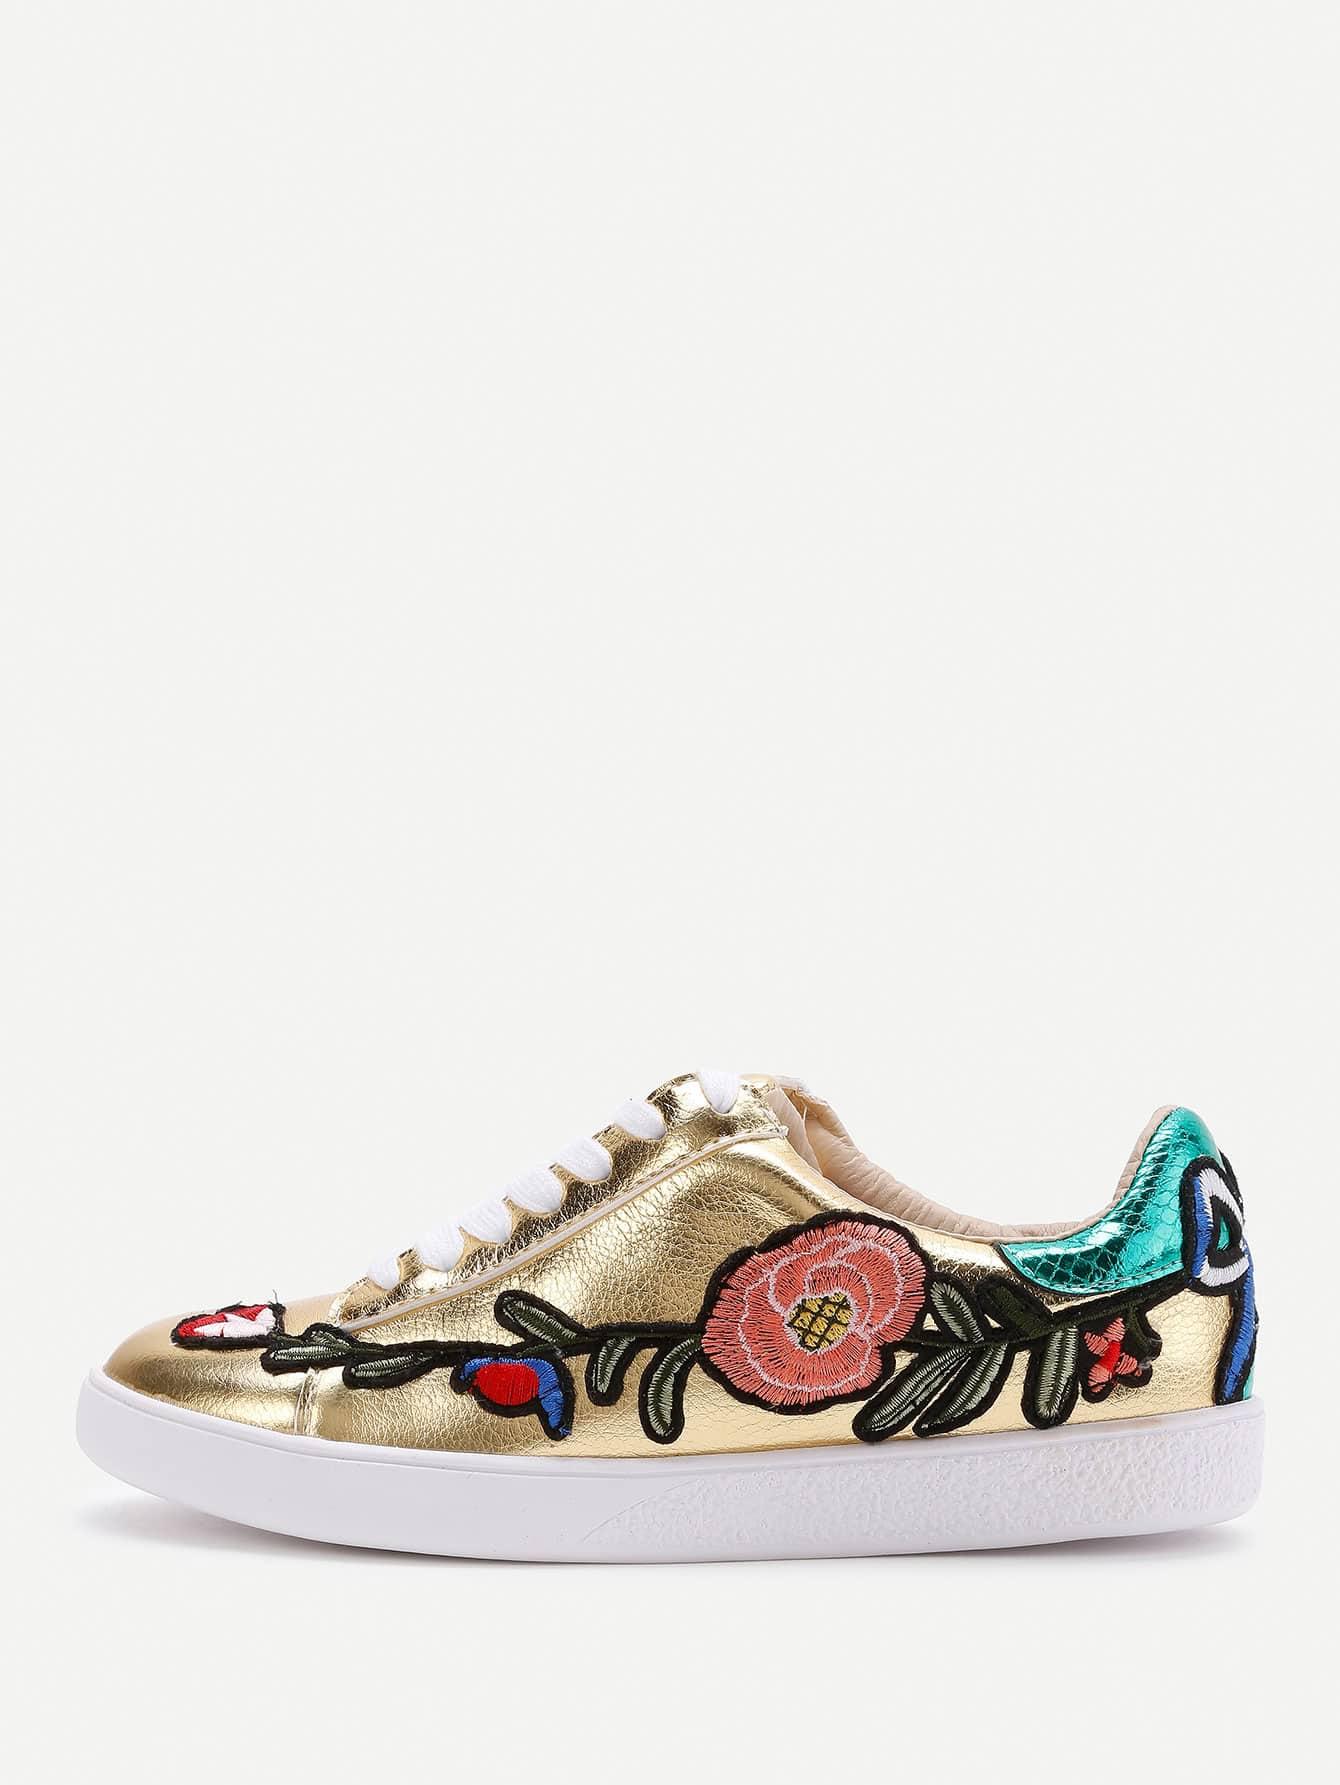 Фото Embroidery Design Lace Up Sneakers. Купить с доставкой